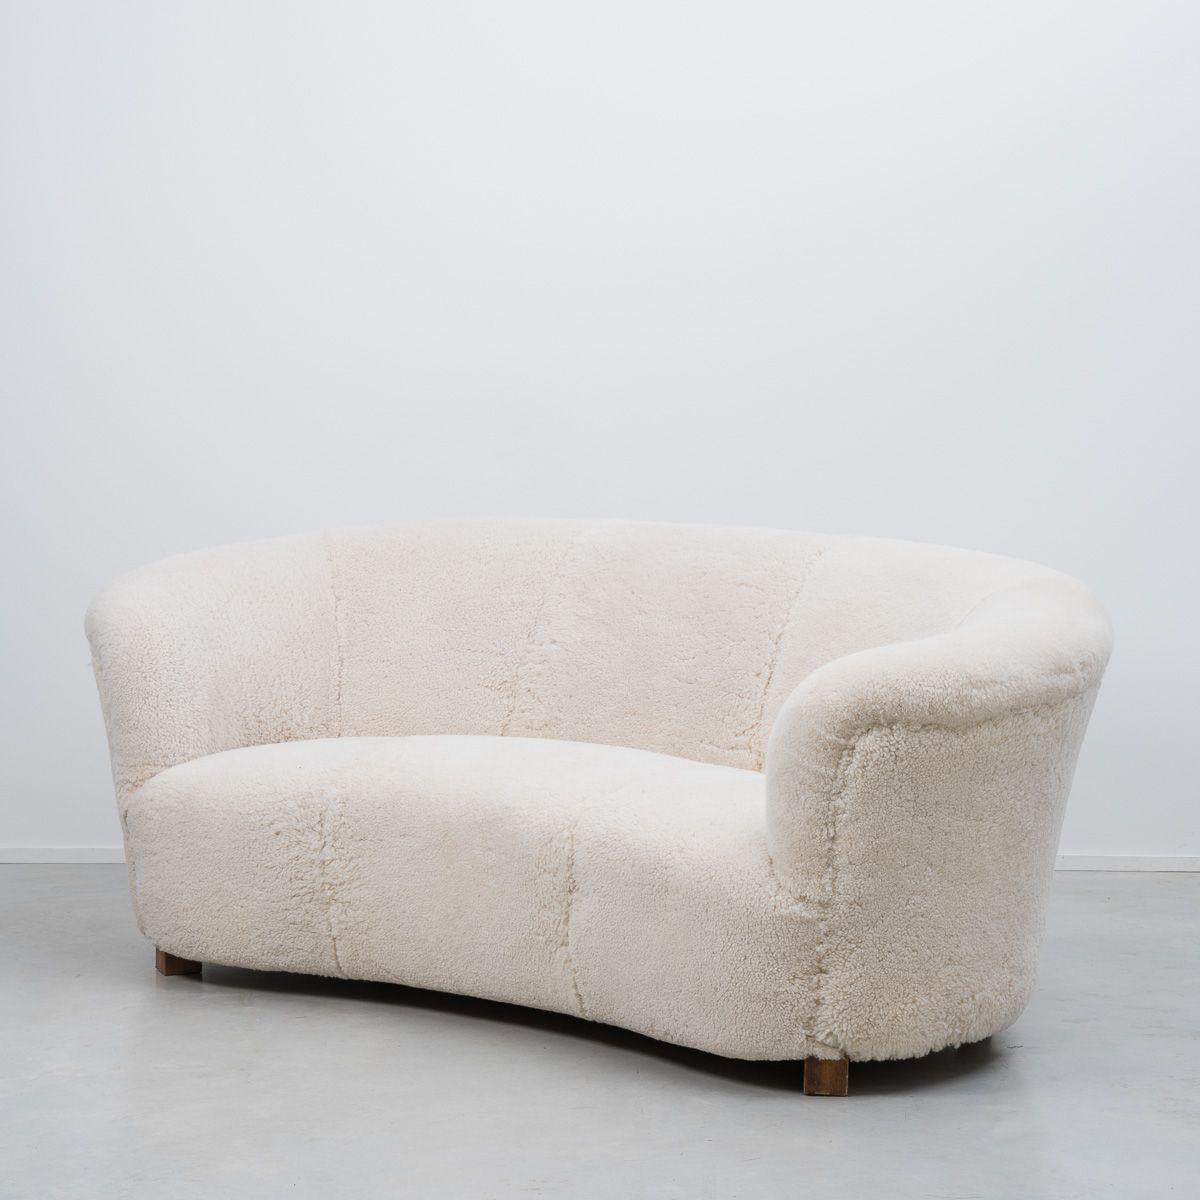 d nisches banana sofa von slagelse m belv rk 1940er bei pamono kaufen. Black Bedroom Furniture Sets. Home Design Ideas